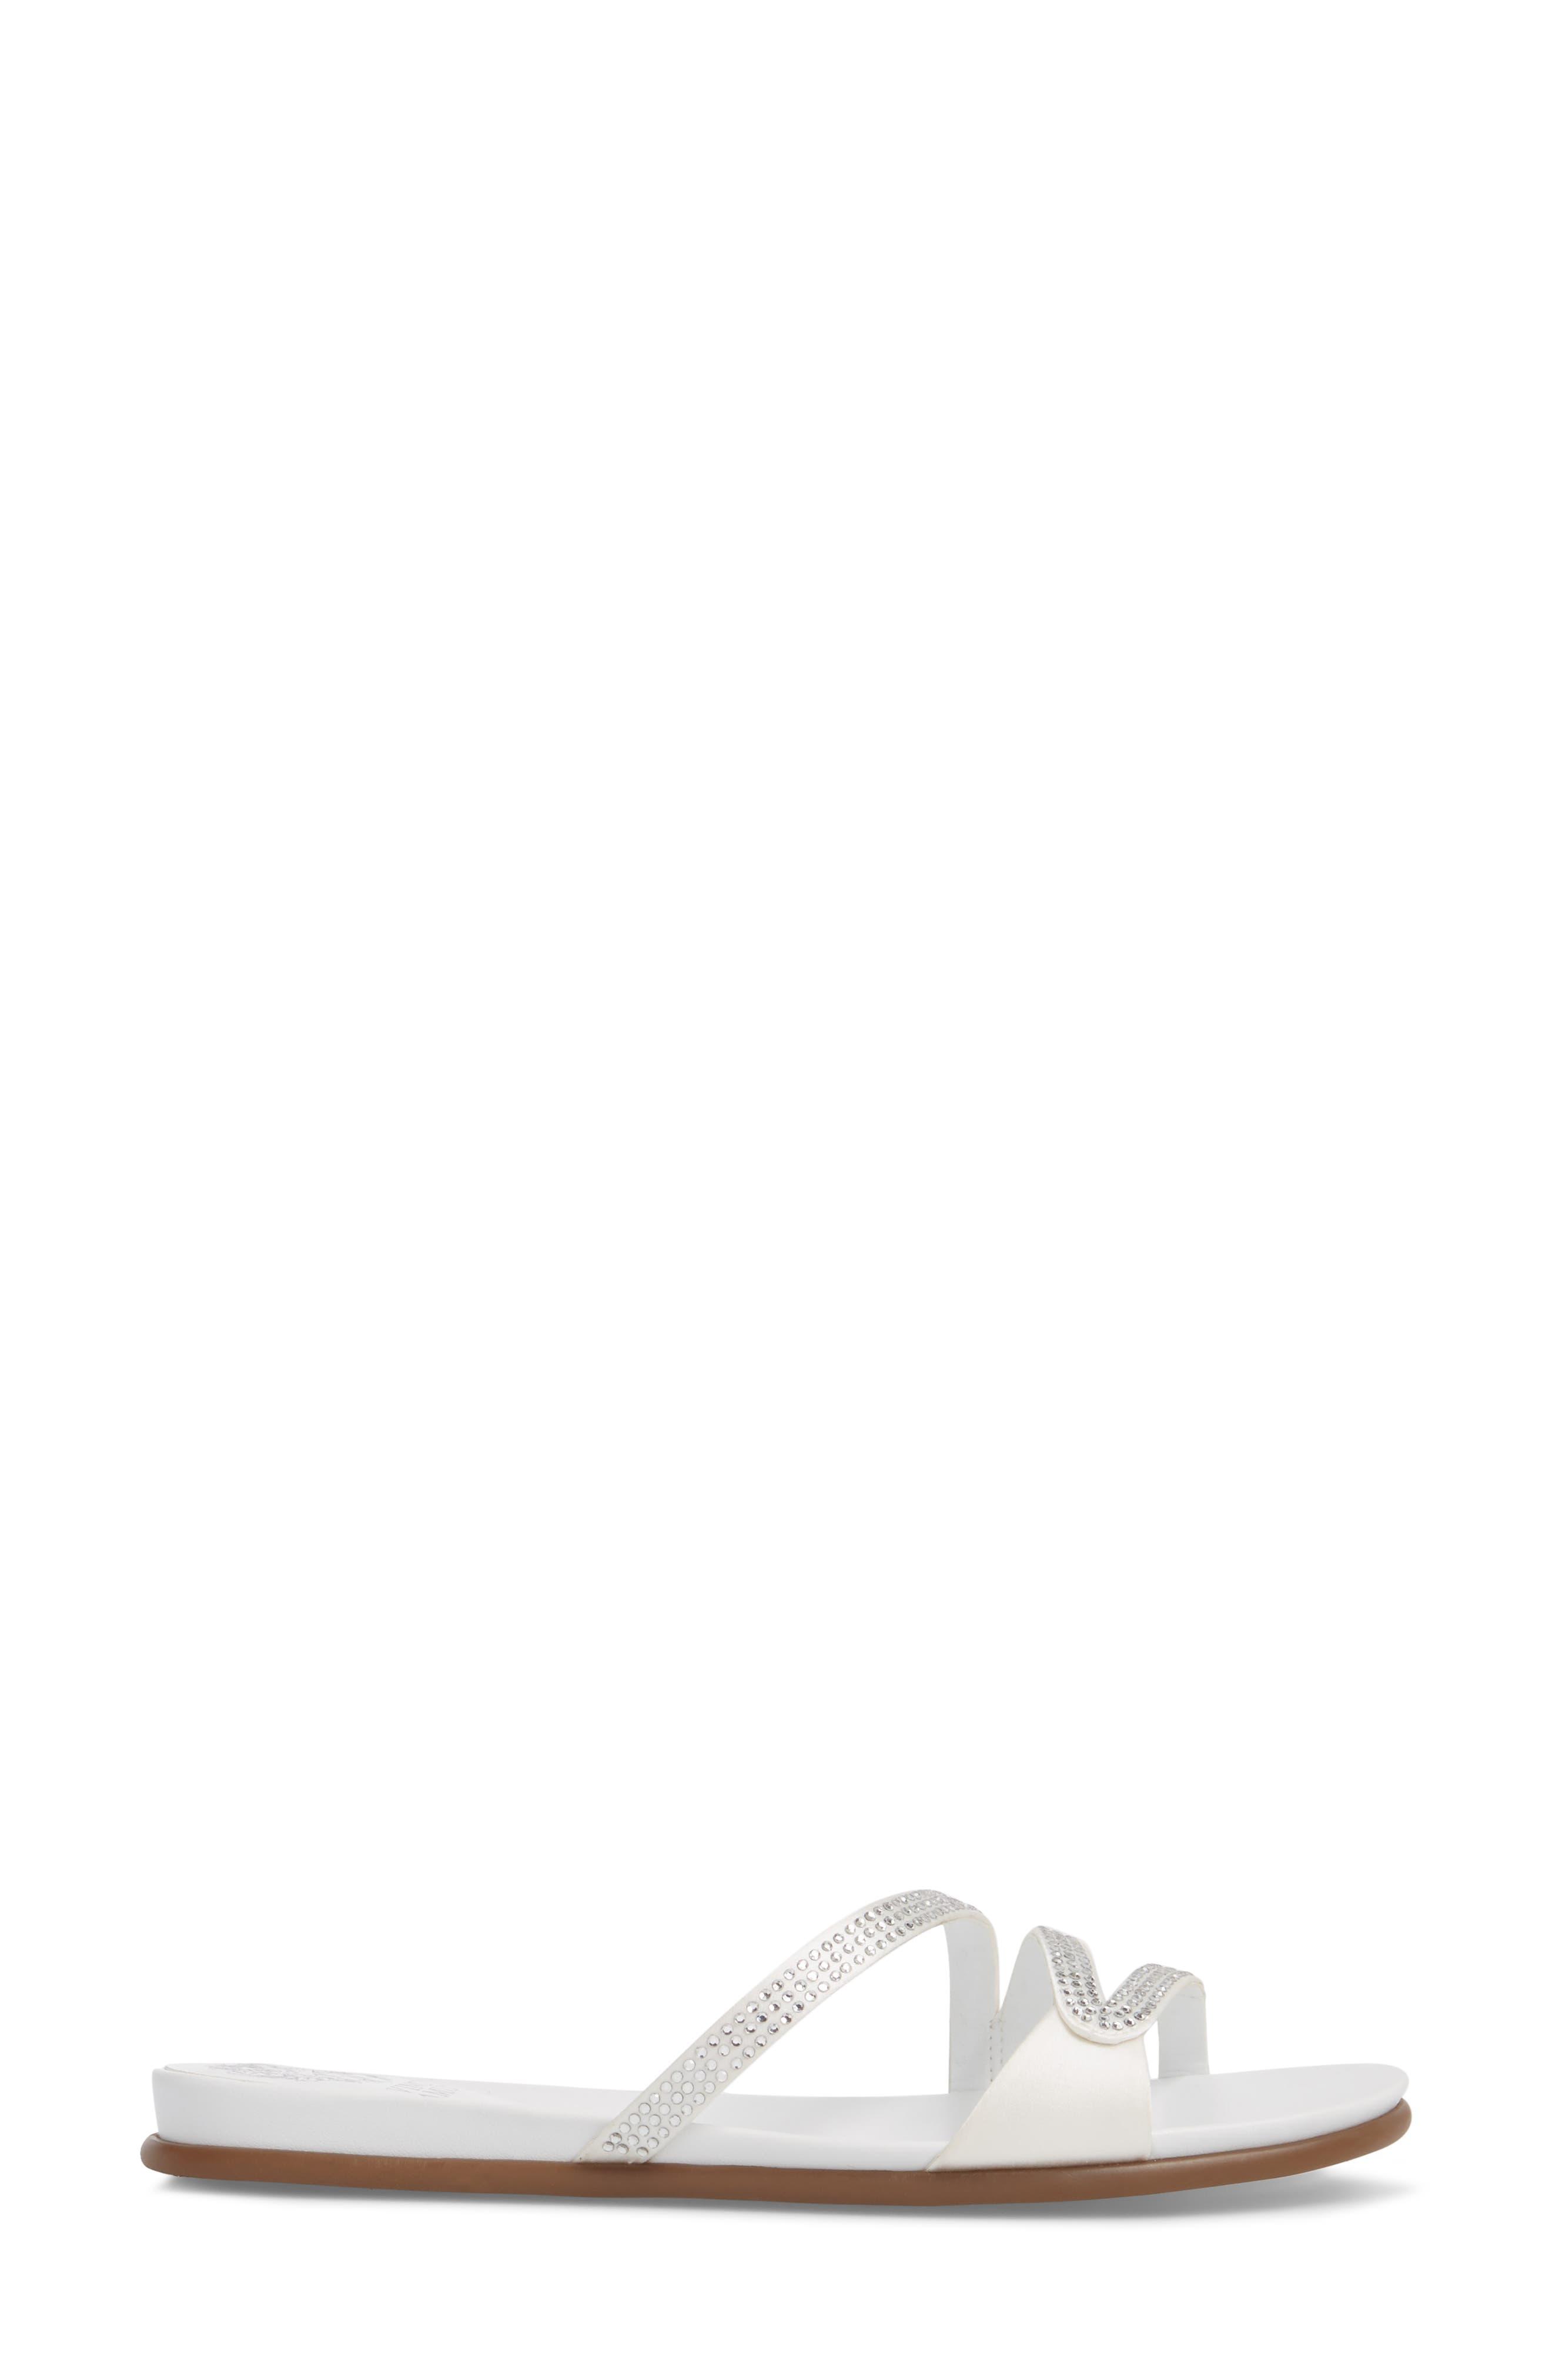 Elouisa Crystal Slide Sandal,                             Alternate thumbnail 3, color,                             PURE SATIN